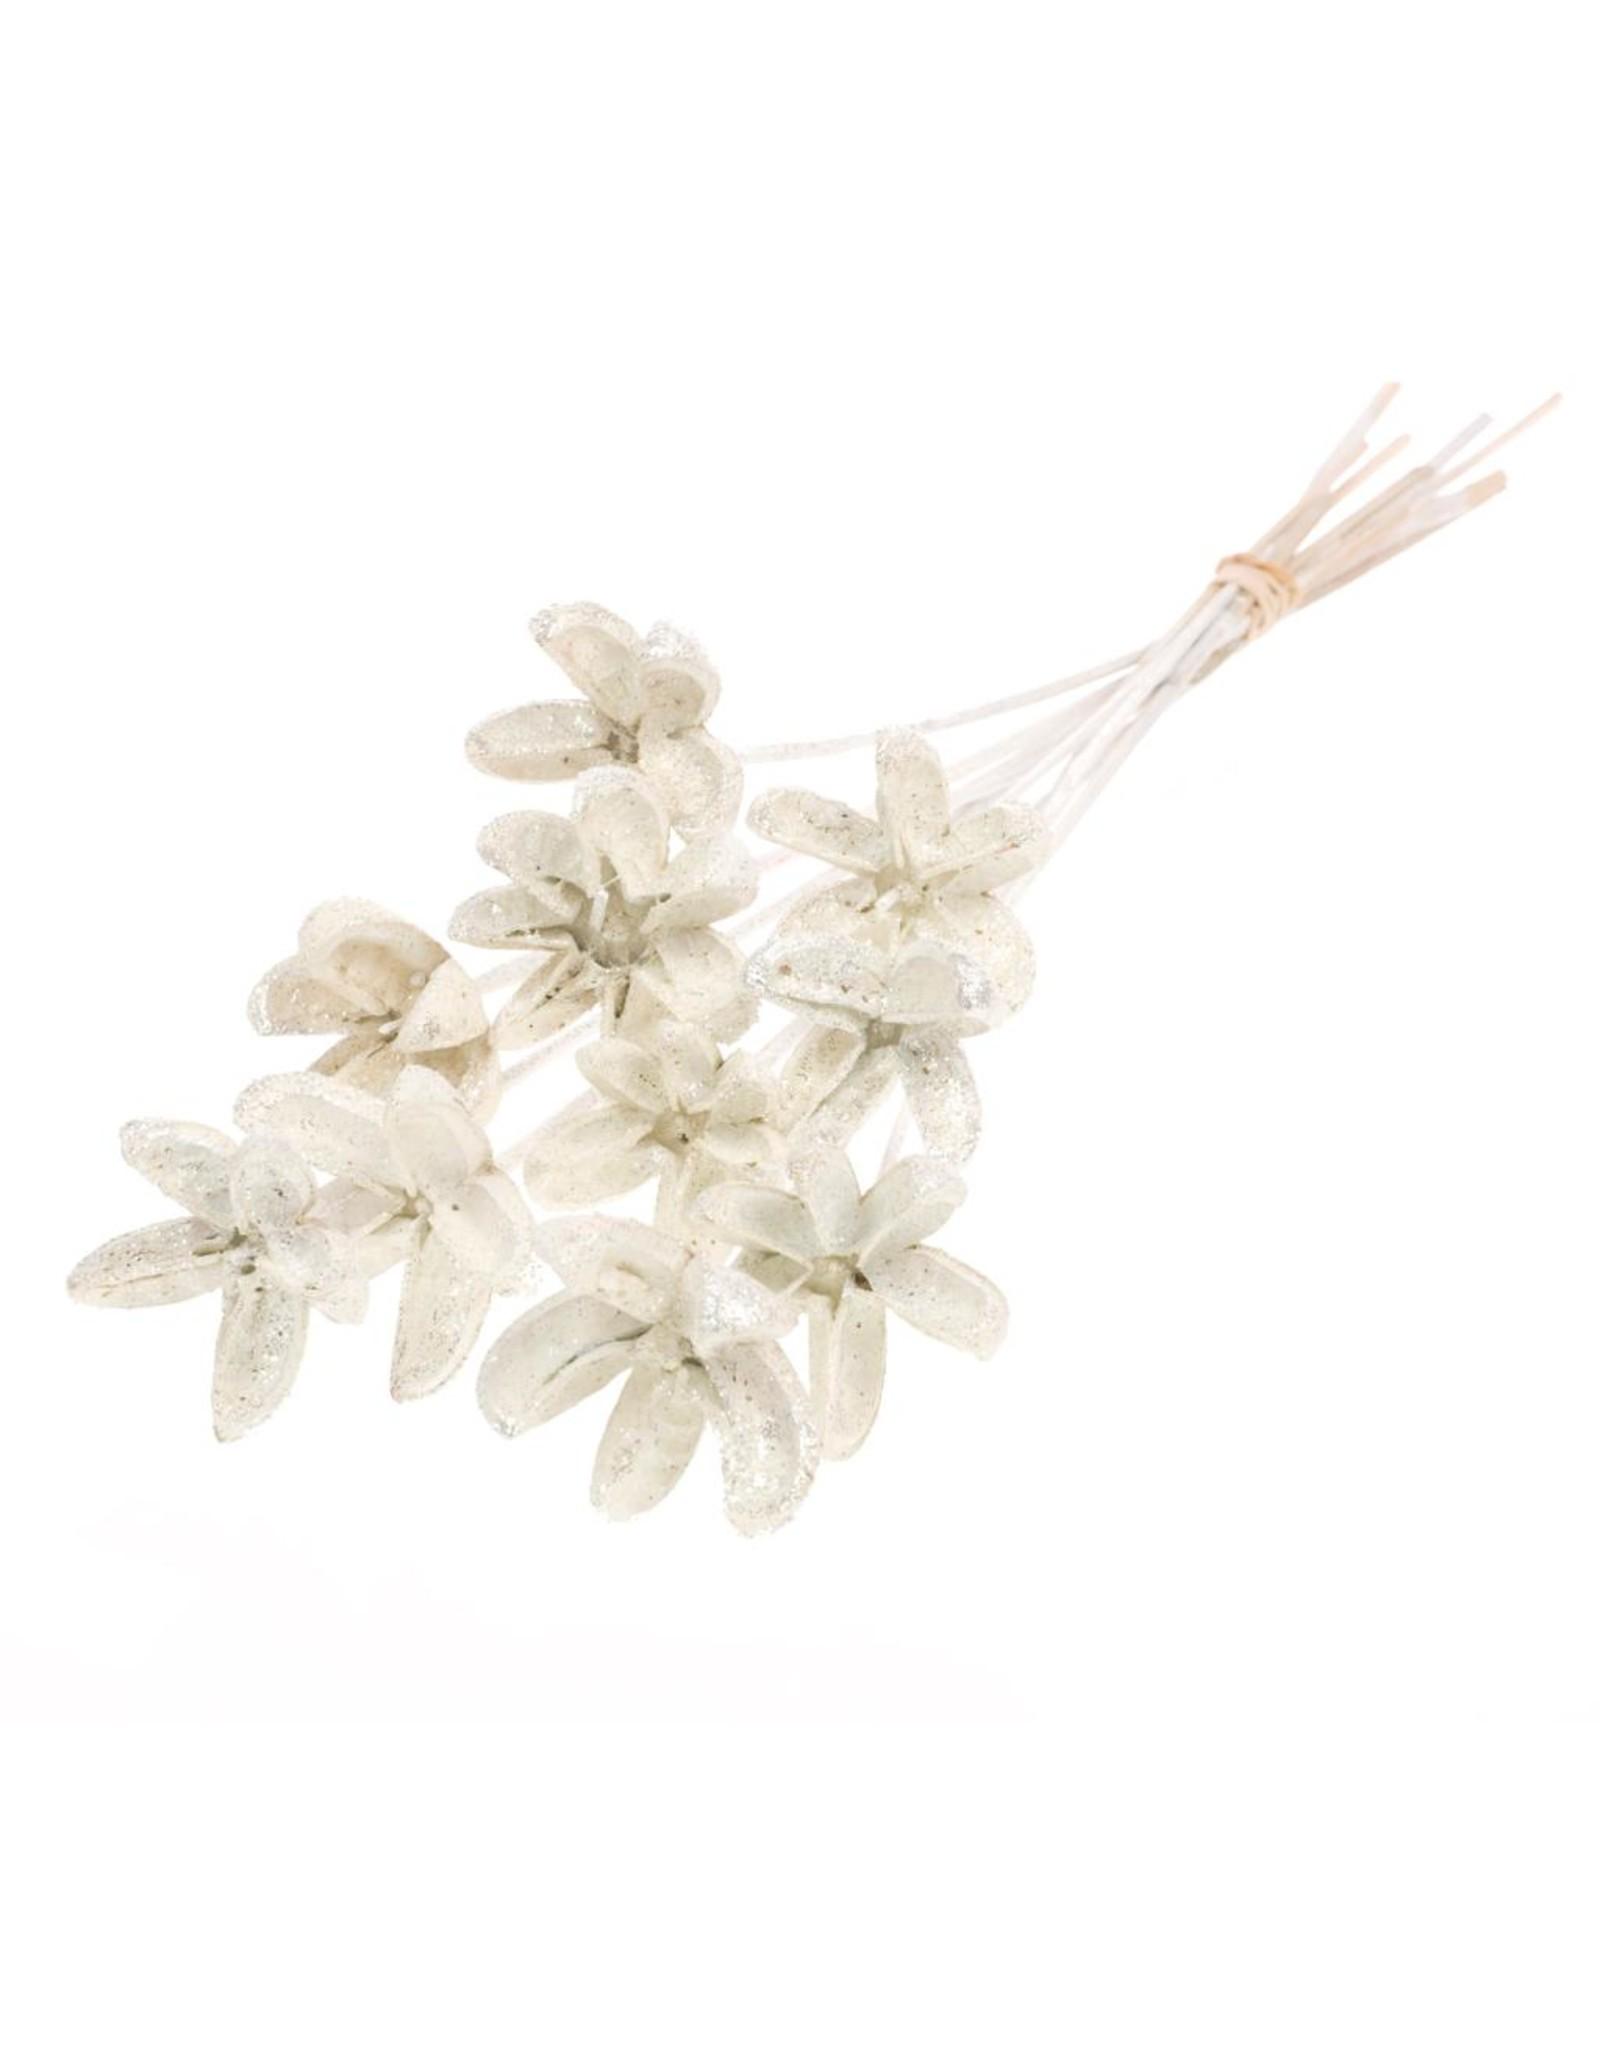 Cartoos Flower on stem 10pc white silver glitter x 15